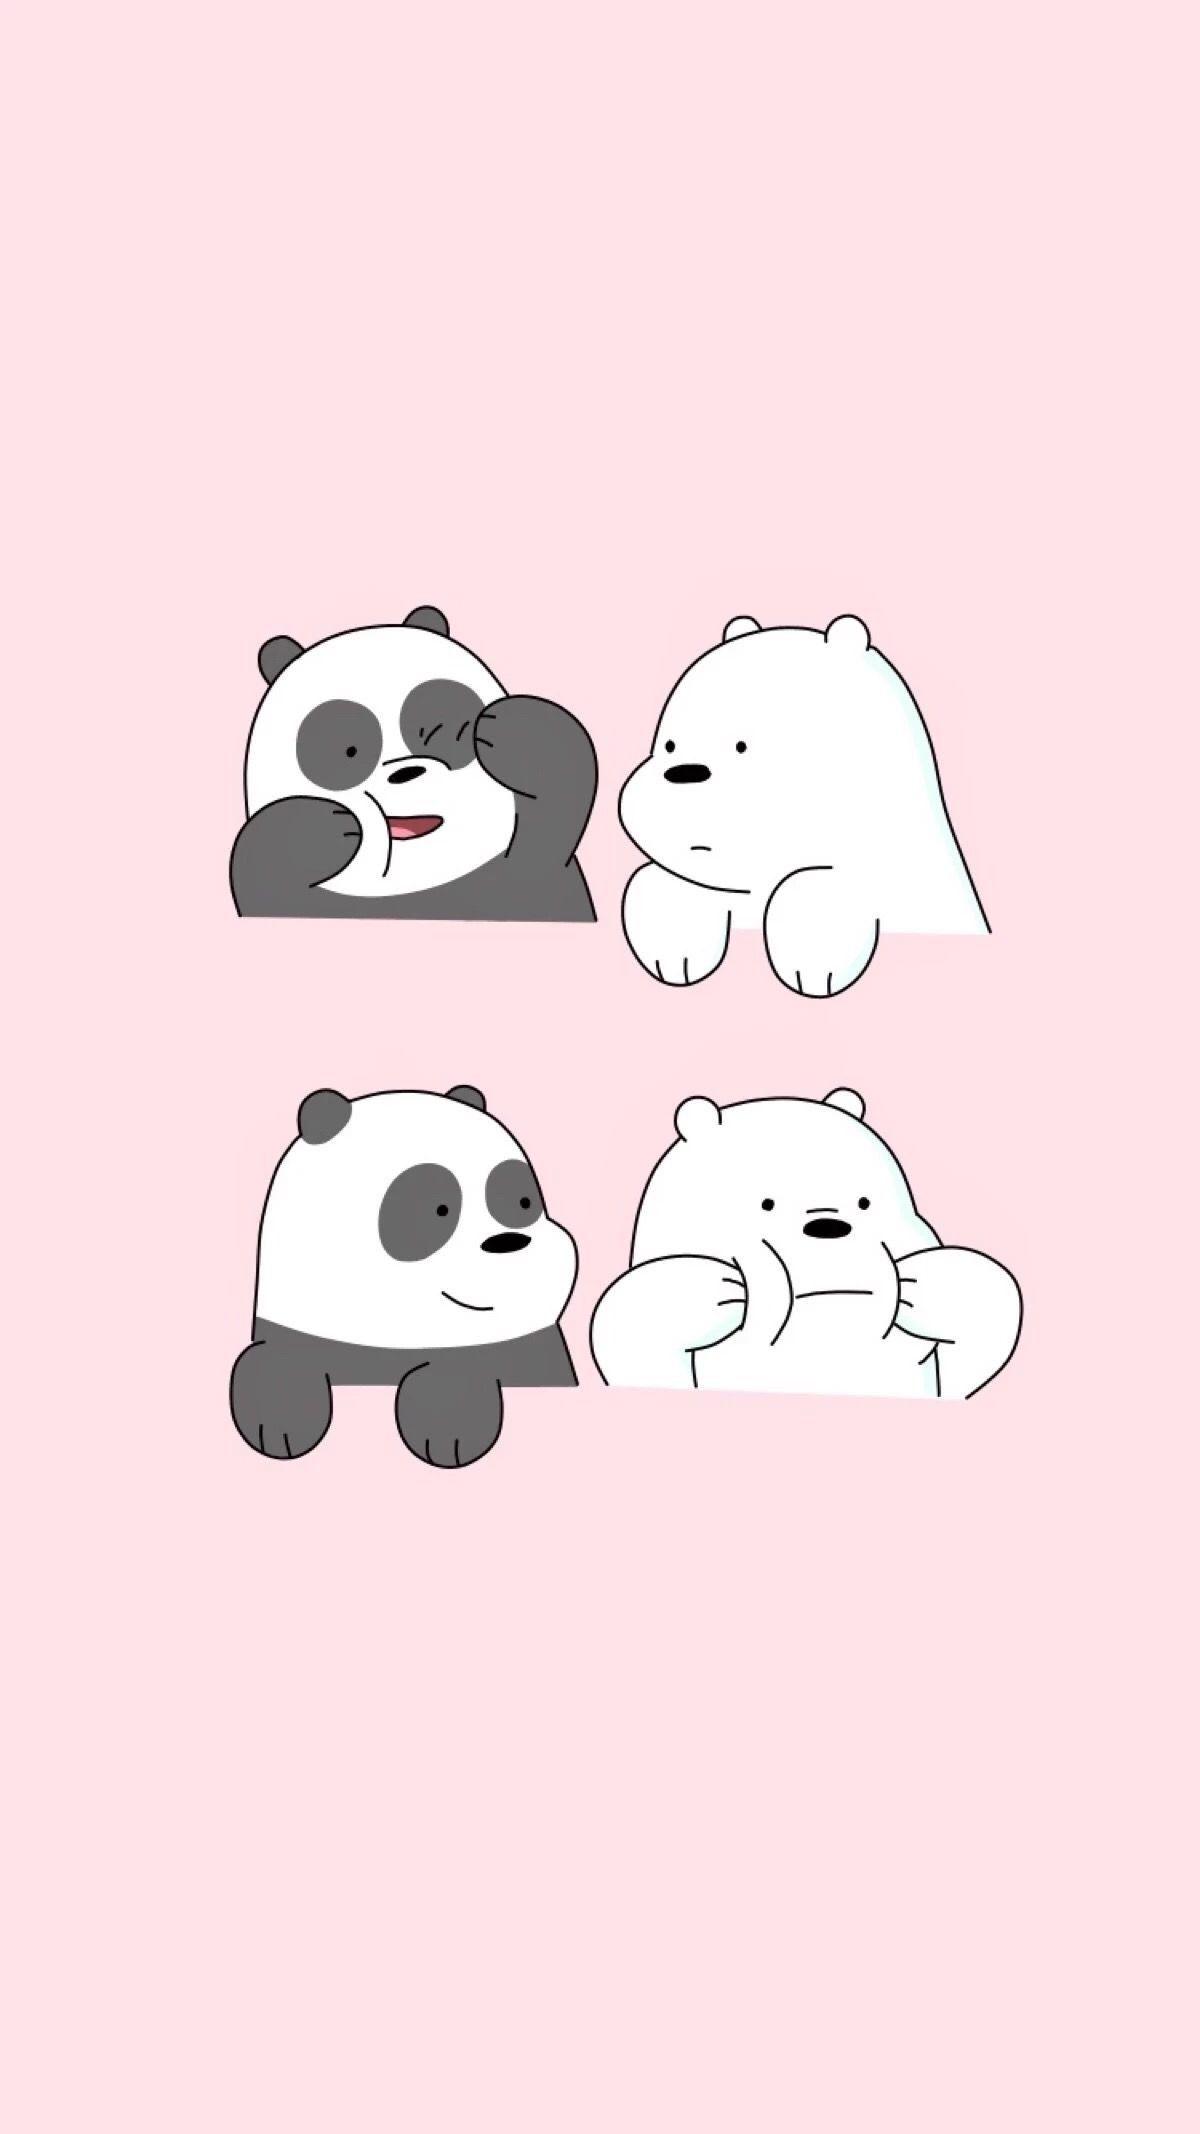 Kawaii Panda Wallpaper 83 Images Bear Wallpaper Cute Panda Wallpaper Cute Cartoon Wallpapers